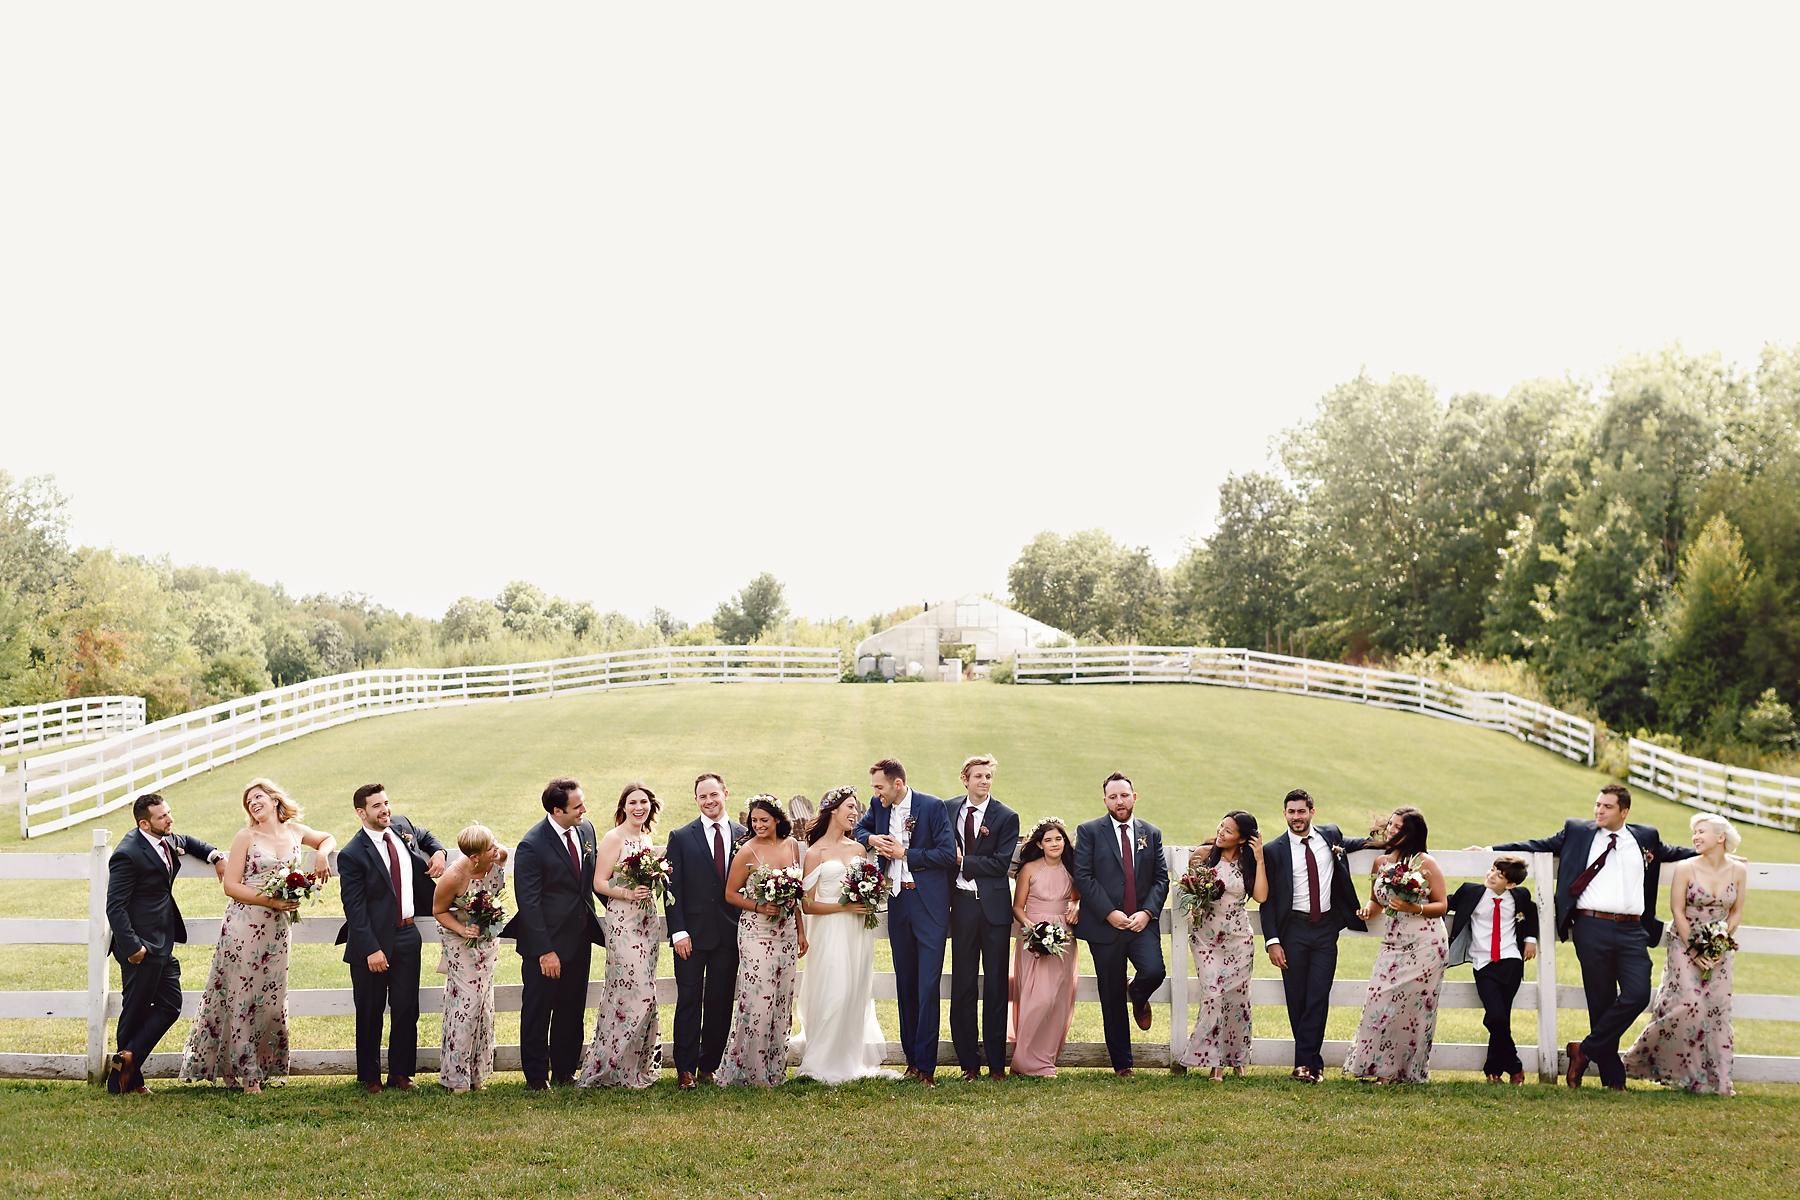 Barn at liberty farms wedding - 018.JPG